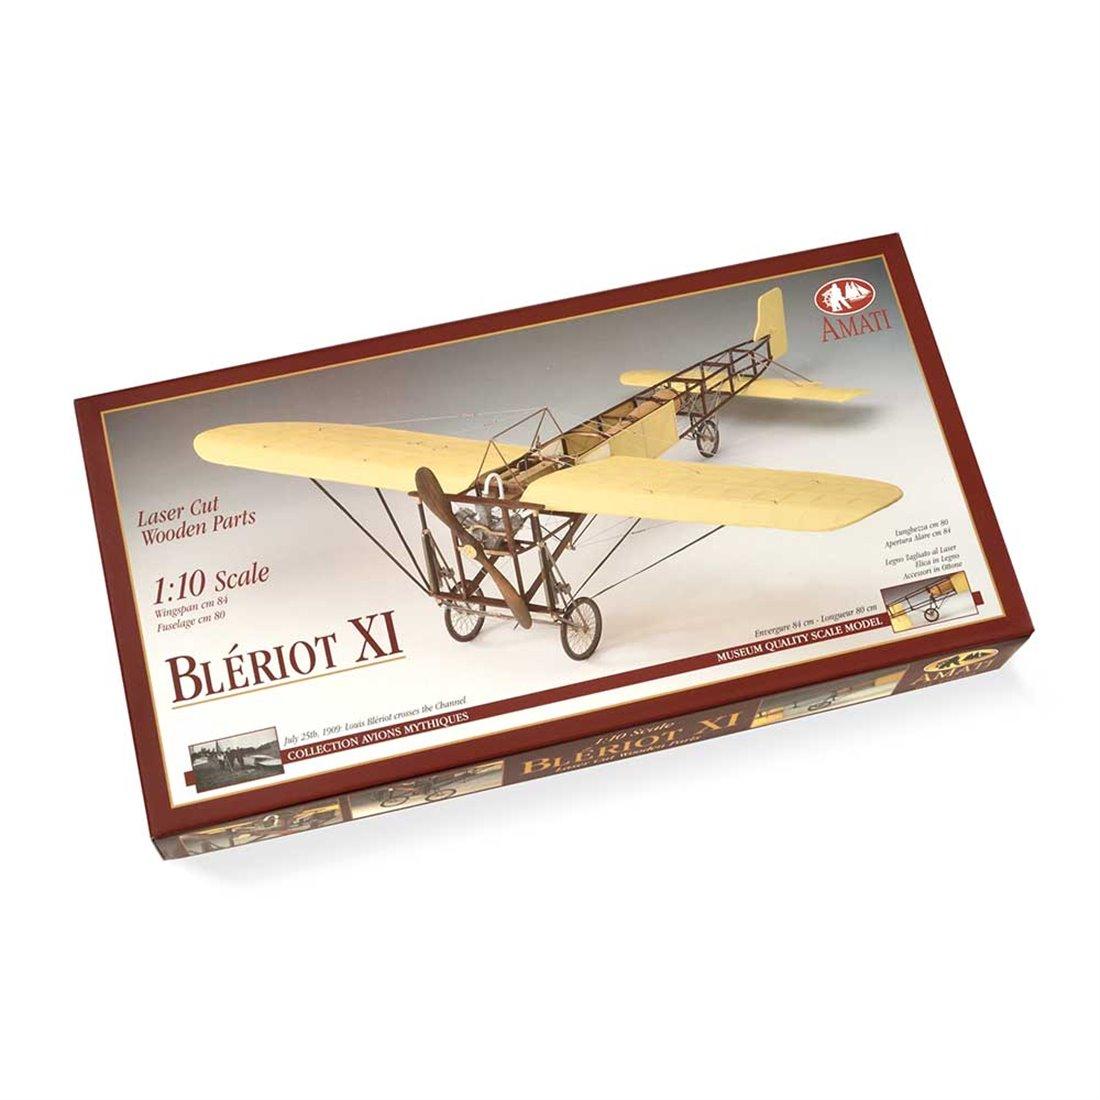 Bleriot plane